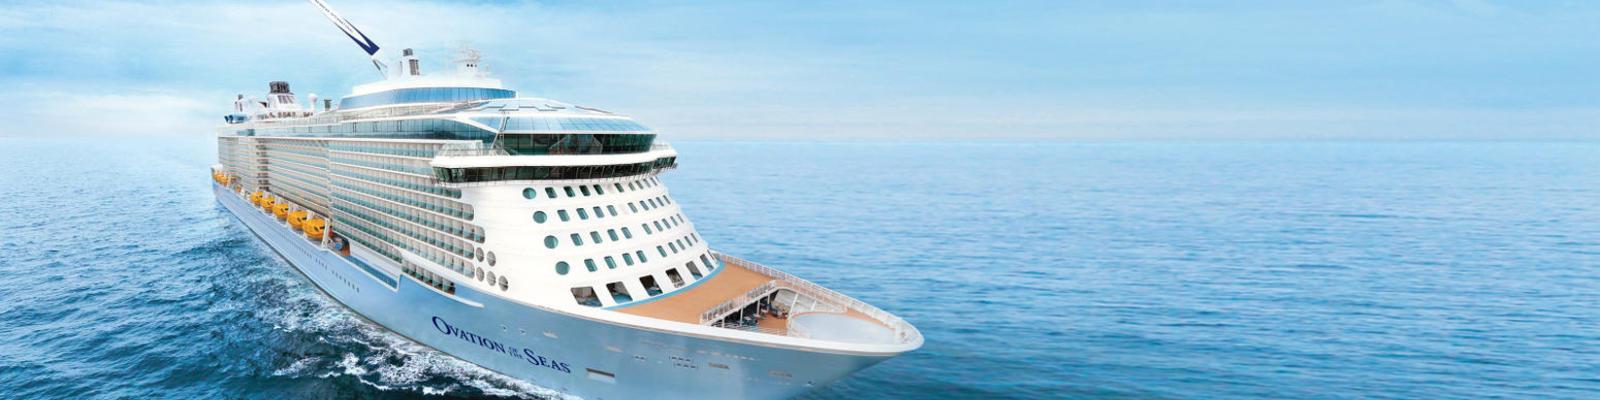 Royal Caribbean's Ovation of the Seas sets sail.